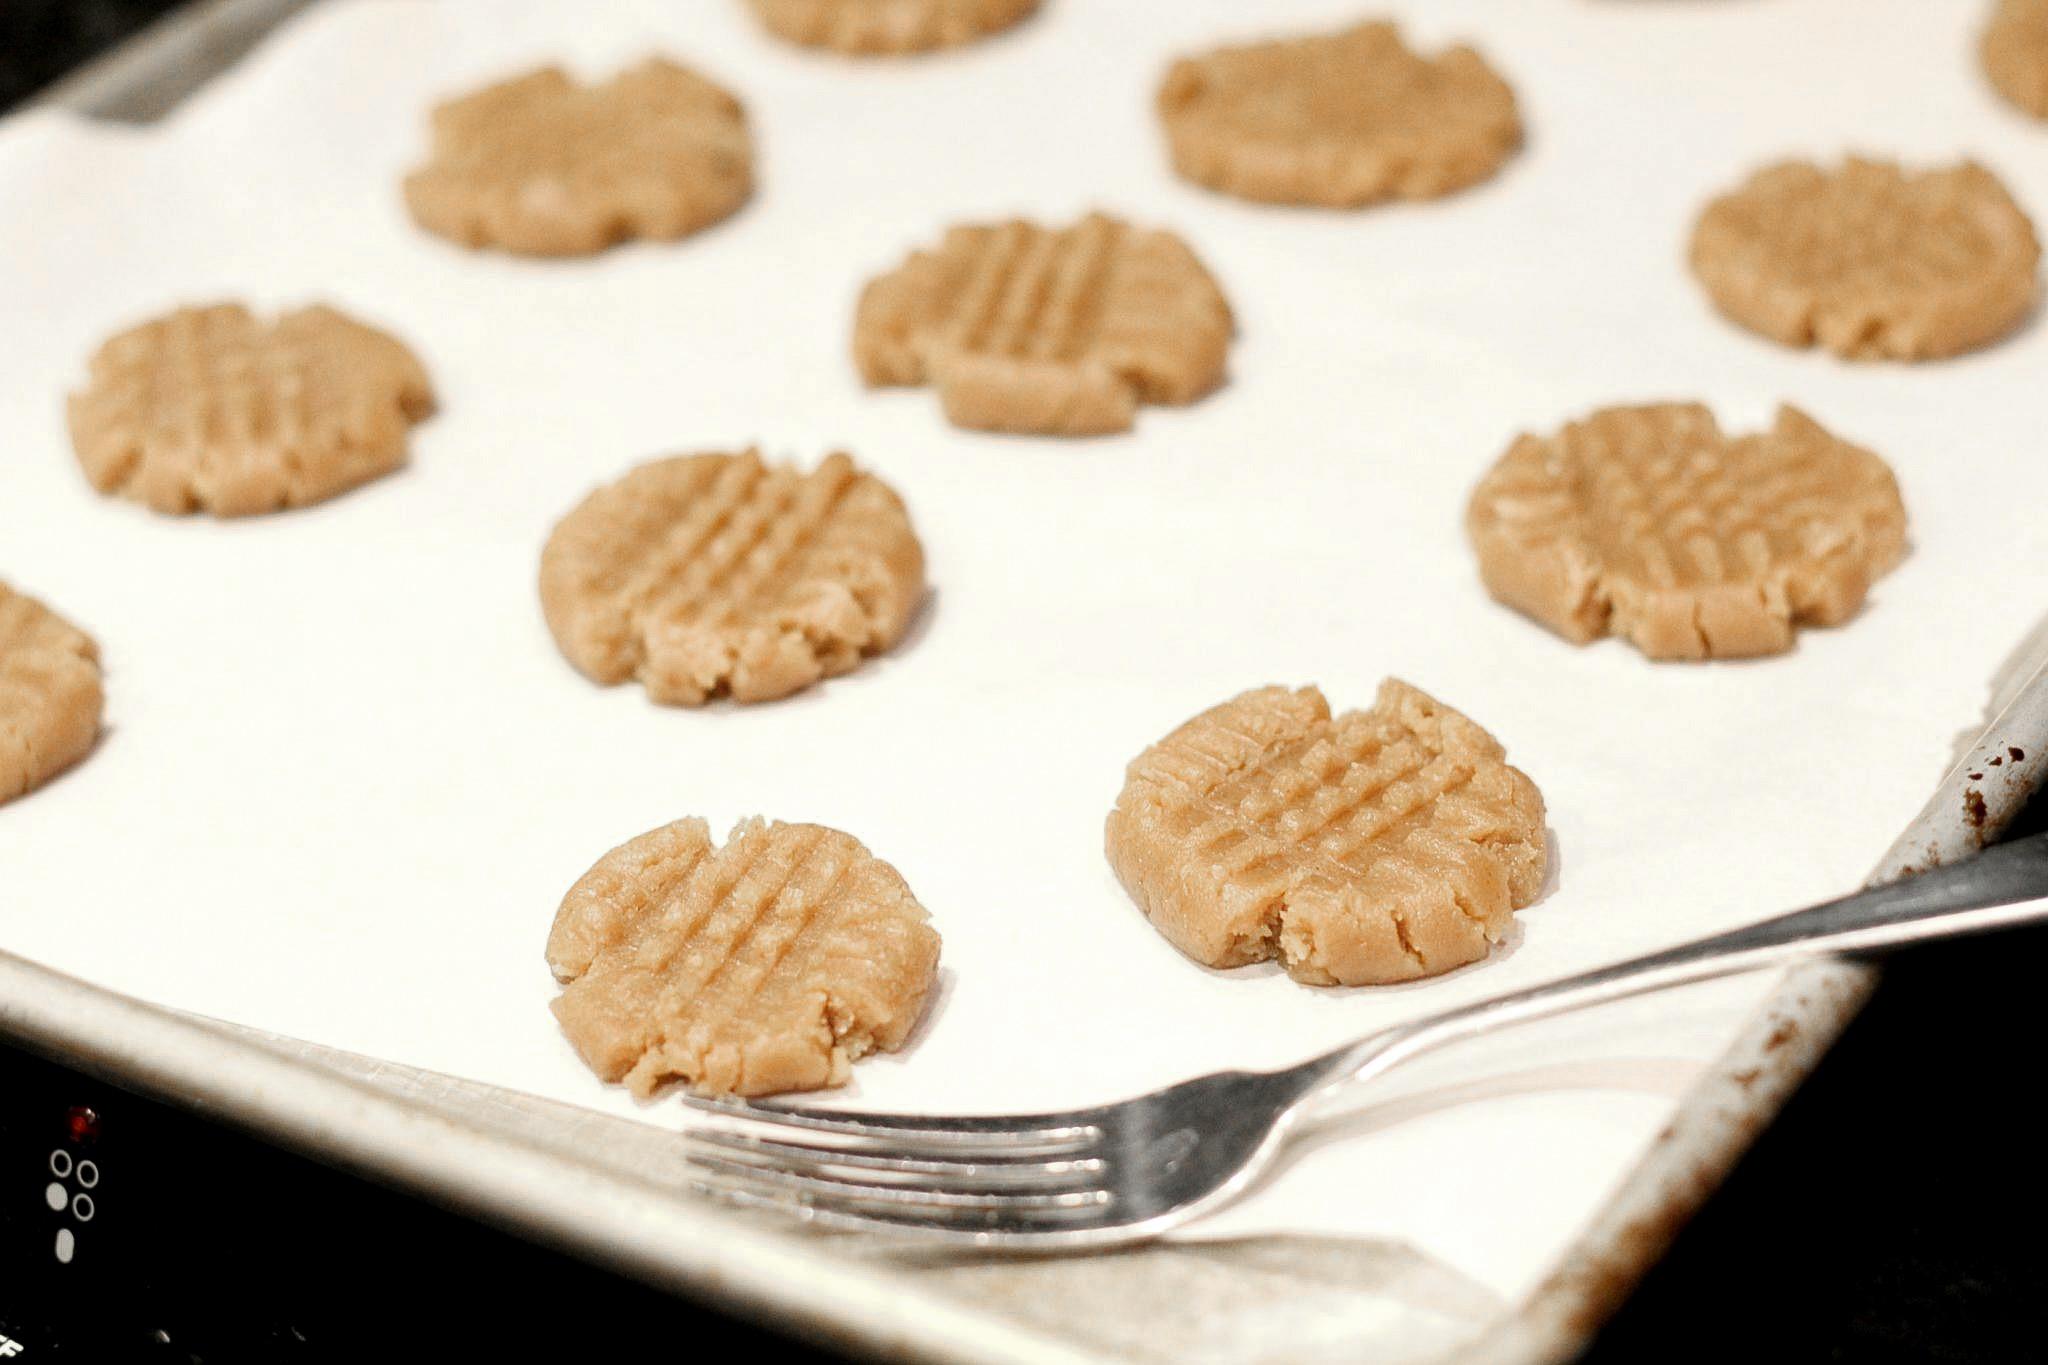 Easy Peanut Butter Cookies, The Best Peanut Butter Cookies, Cookie Exchange, Christmas Cookies, Soft Peanut Butter Cookie Recipe